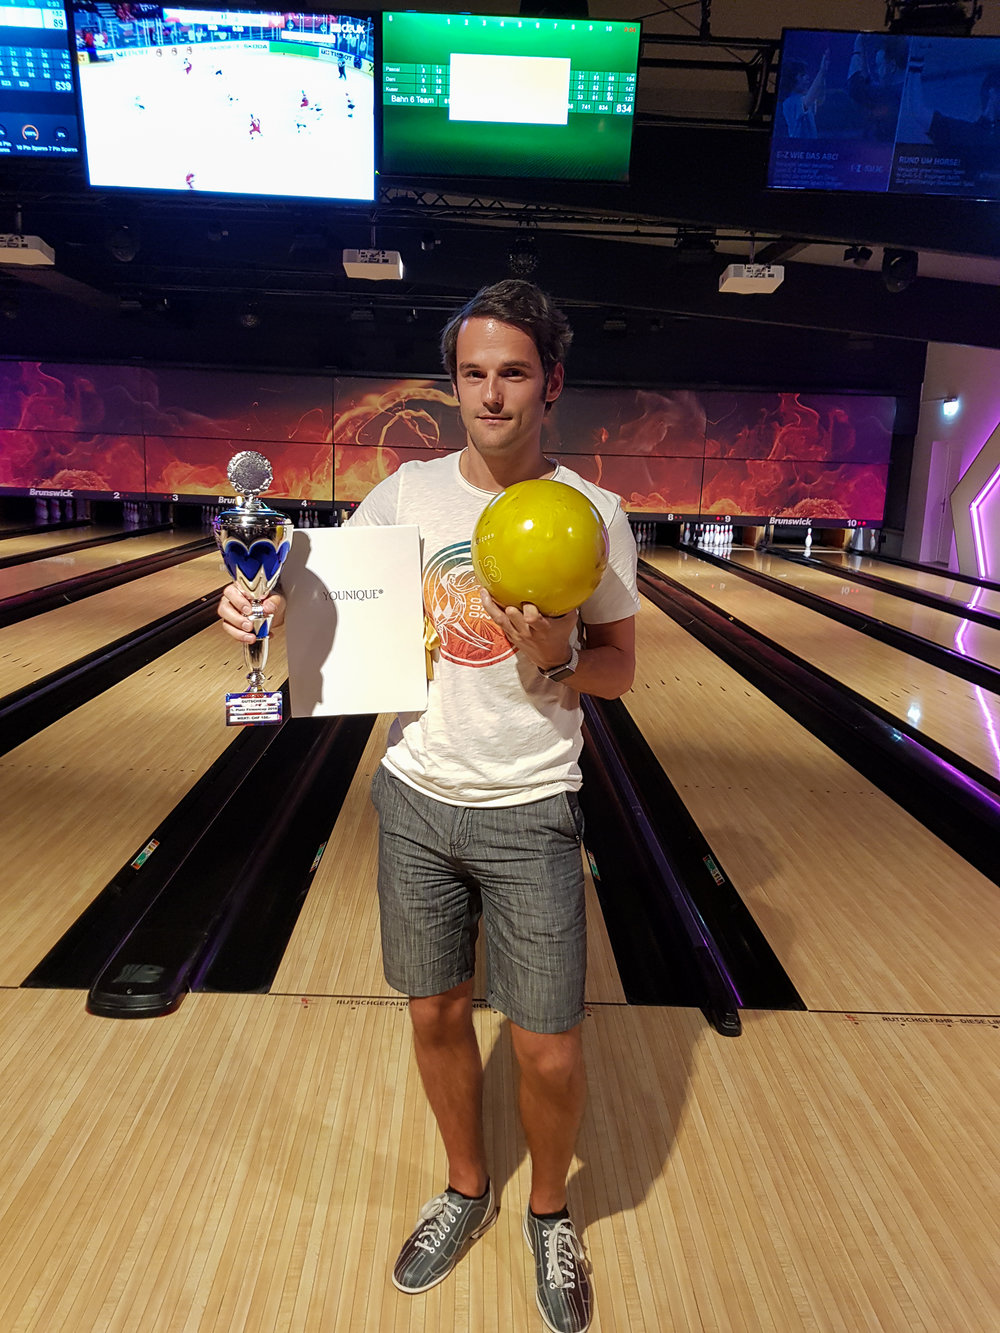 Bester Spieler: Marco Gian Schlatter (197 Punkte)